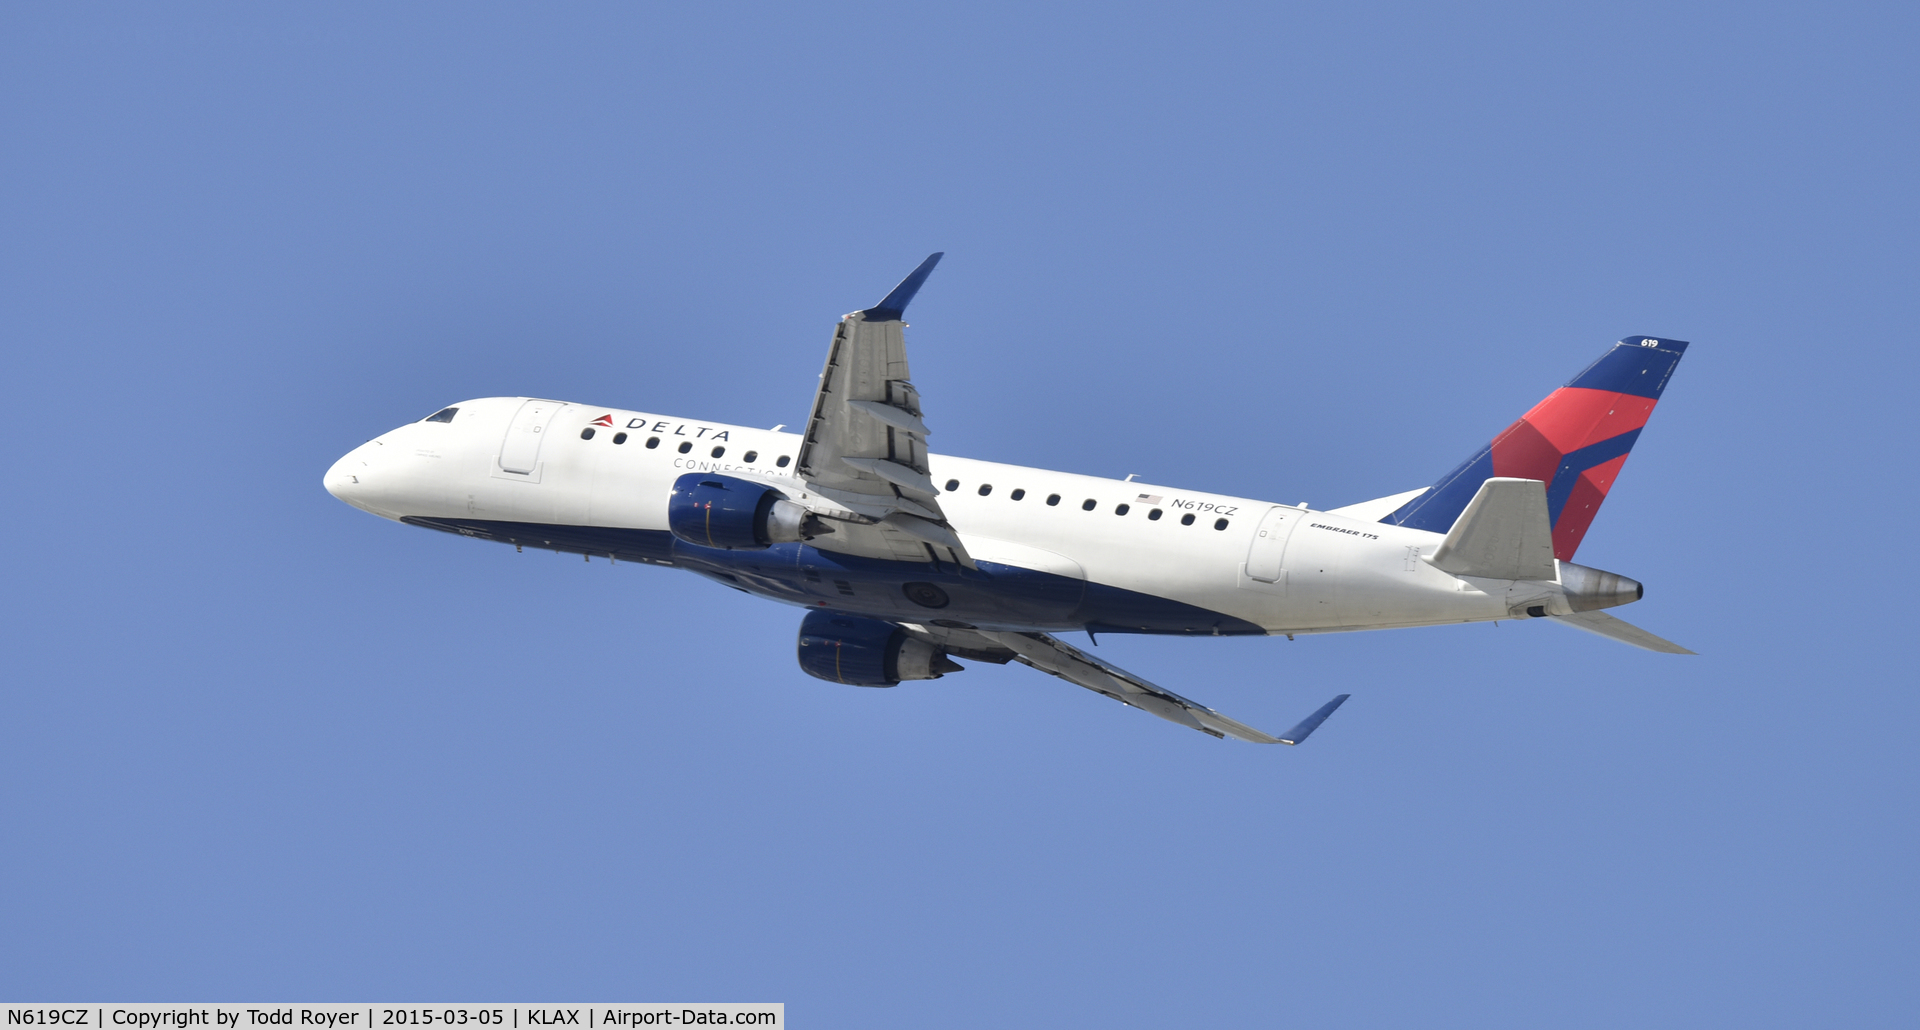 N619CZ, 2008 Embraer 175LR (ERJ-170-200LR) C/N 17000213, Departing LAX on 25R